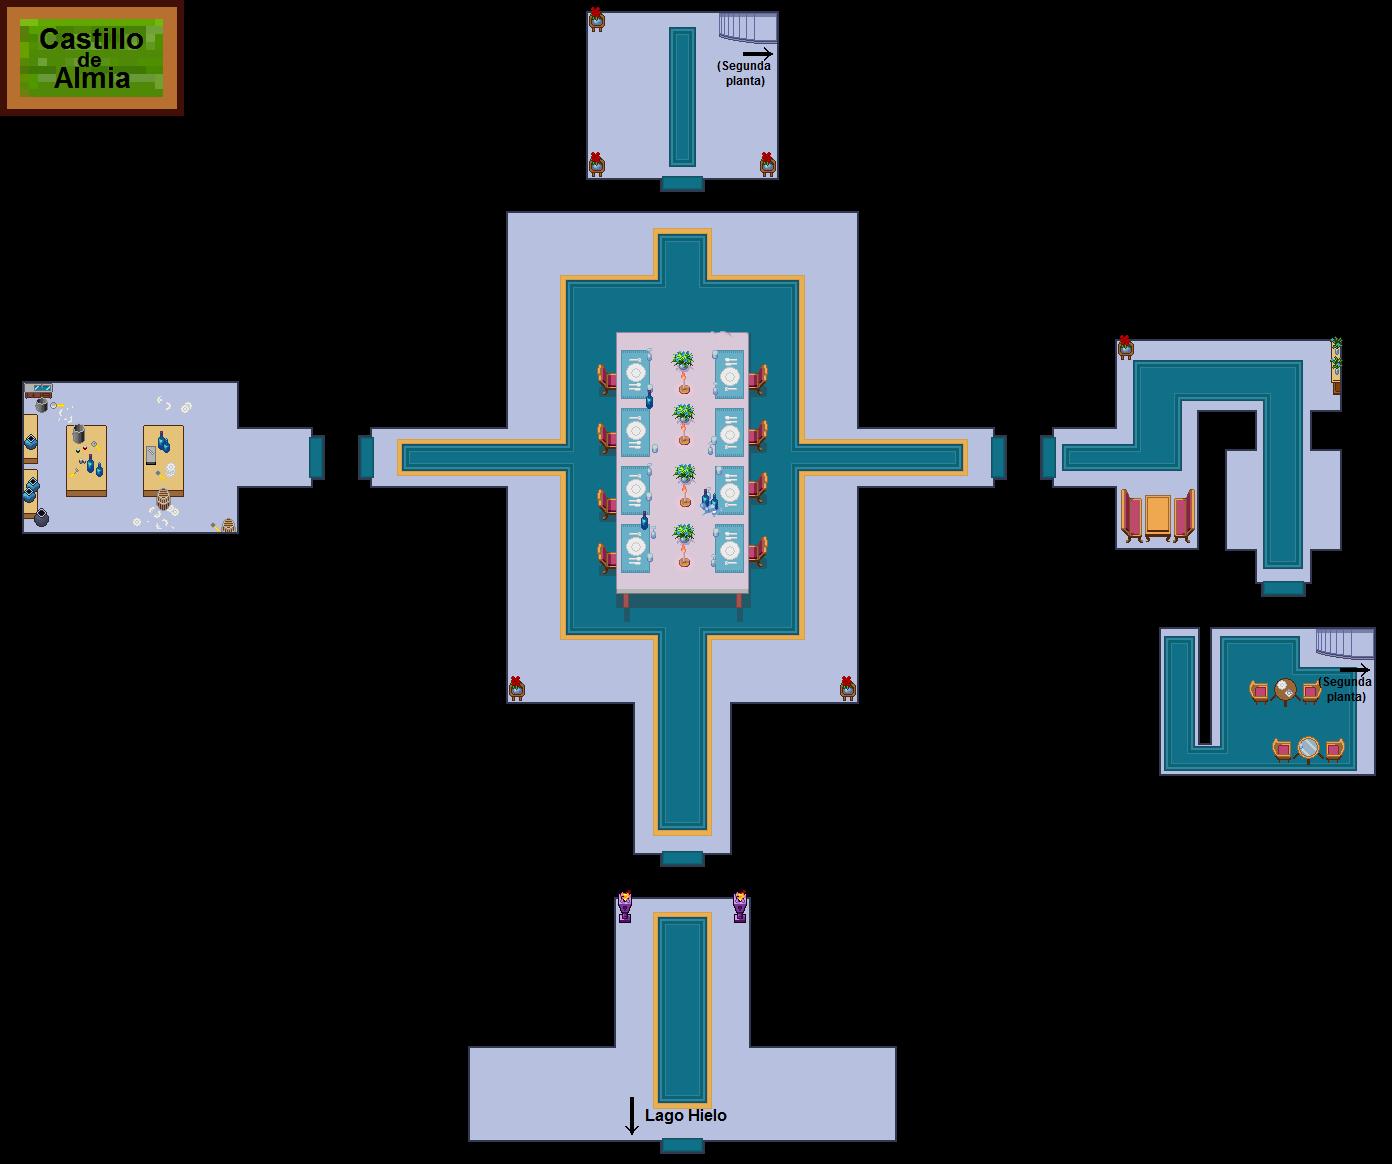 Plano de Castillo de Almia (primera planta)